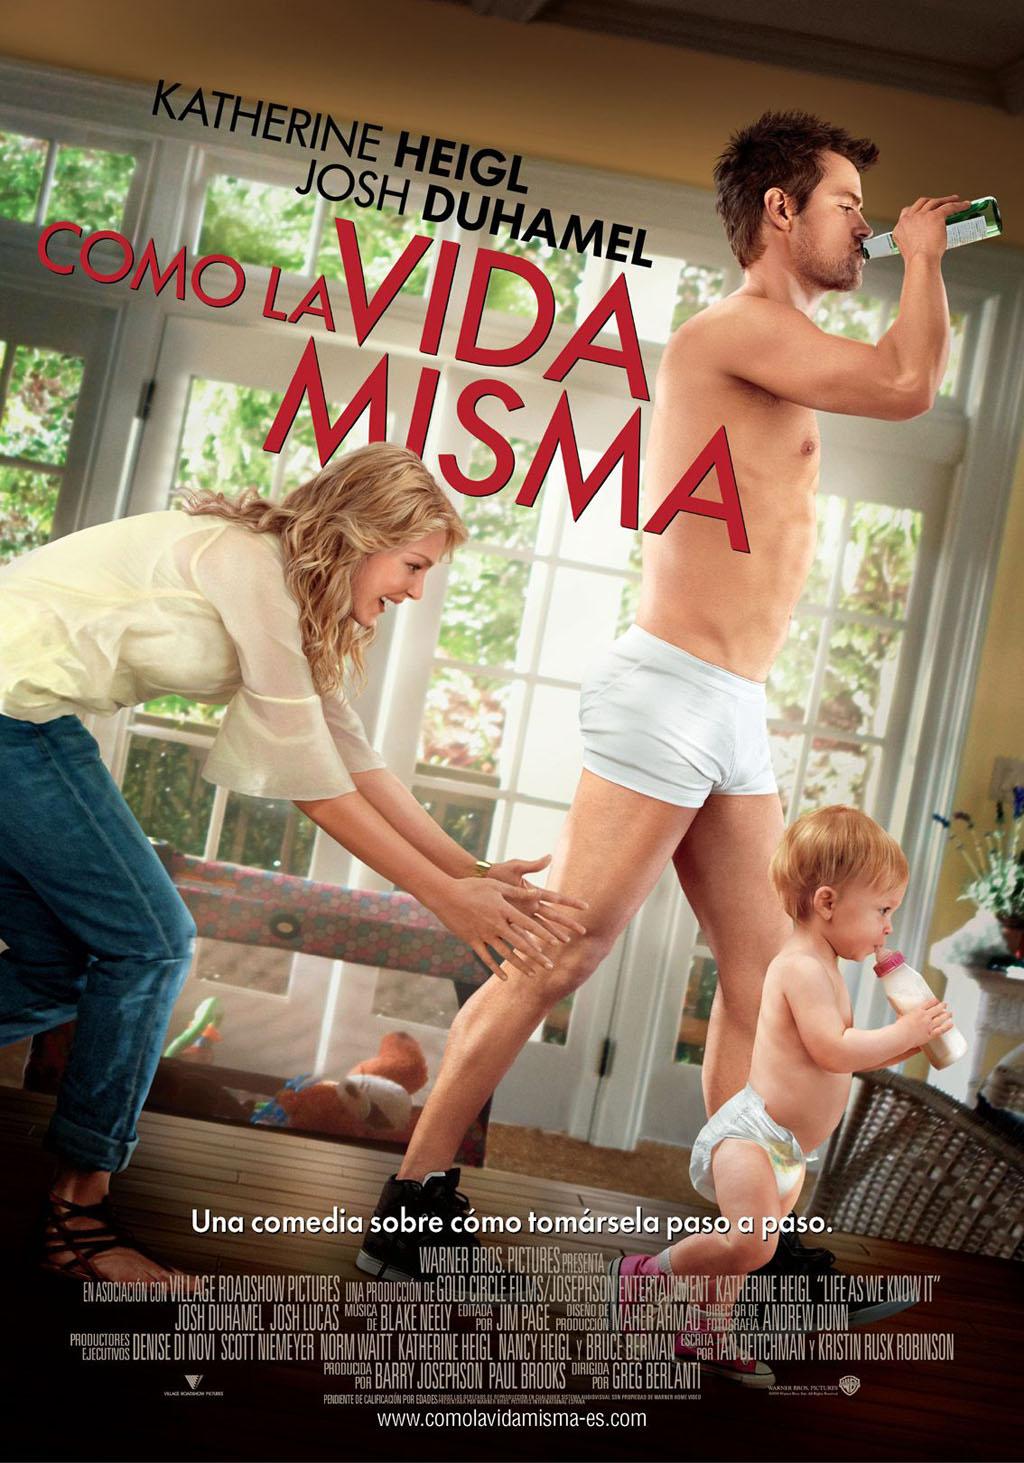 http://3.bp.blogspot.com/_RXXYJrCbuqA/TS4QjUfRQ2I/AAAAAAAAGaY/Xs5SIx-bq8c/s1600/Como_La_Vida_Misma-Cartel.jpg